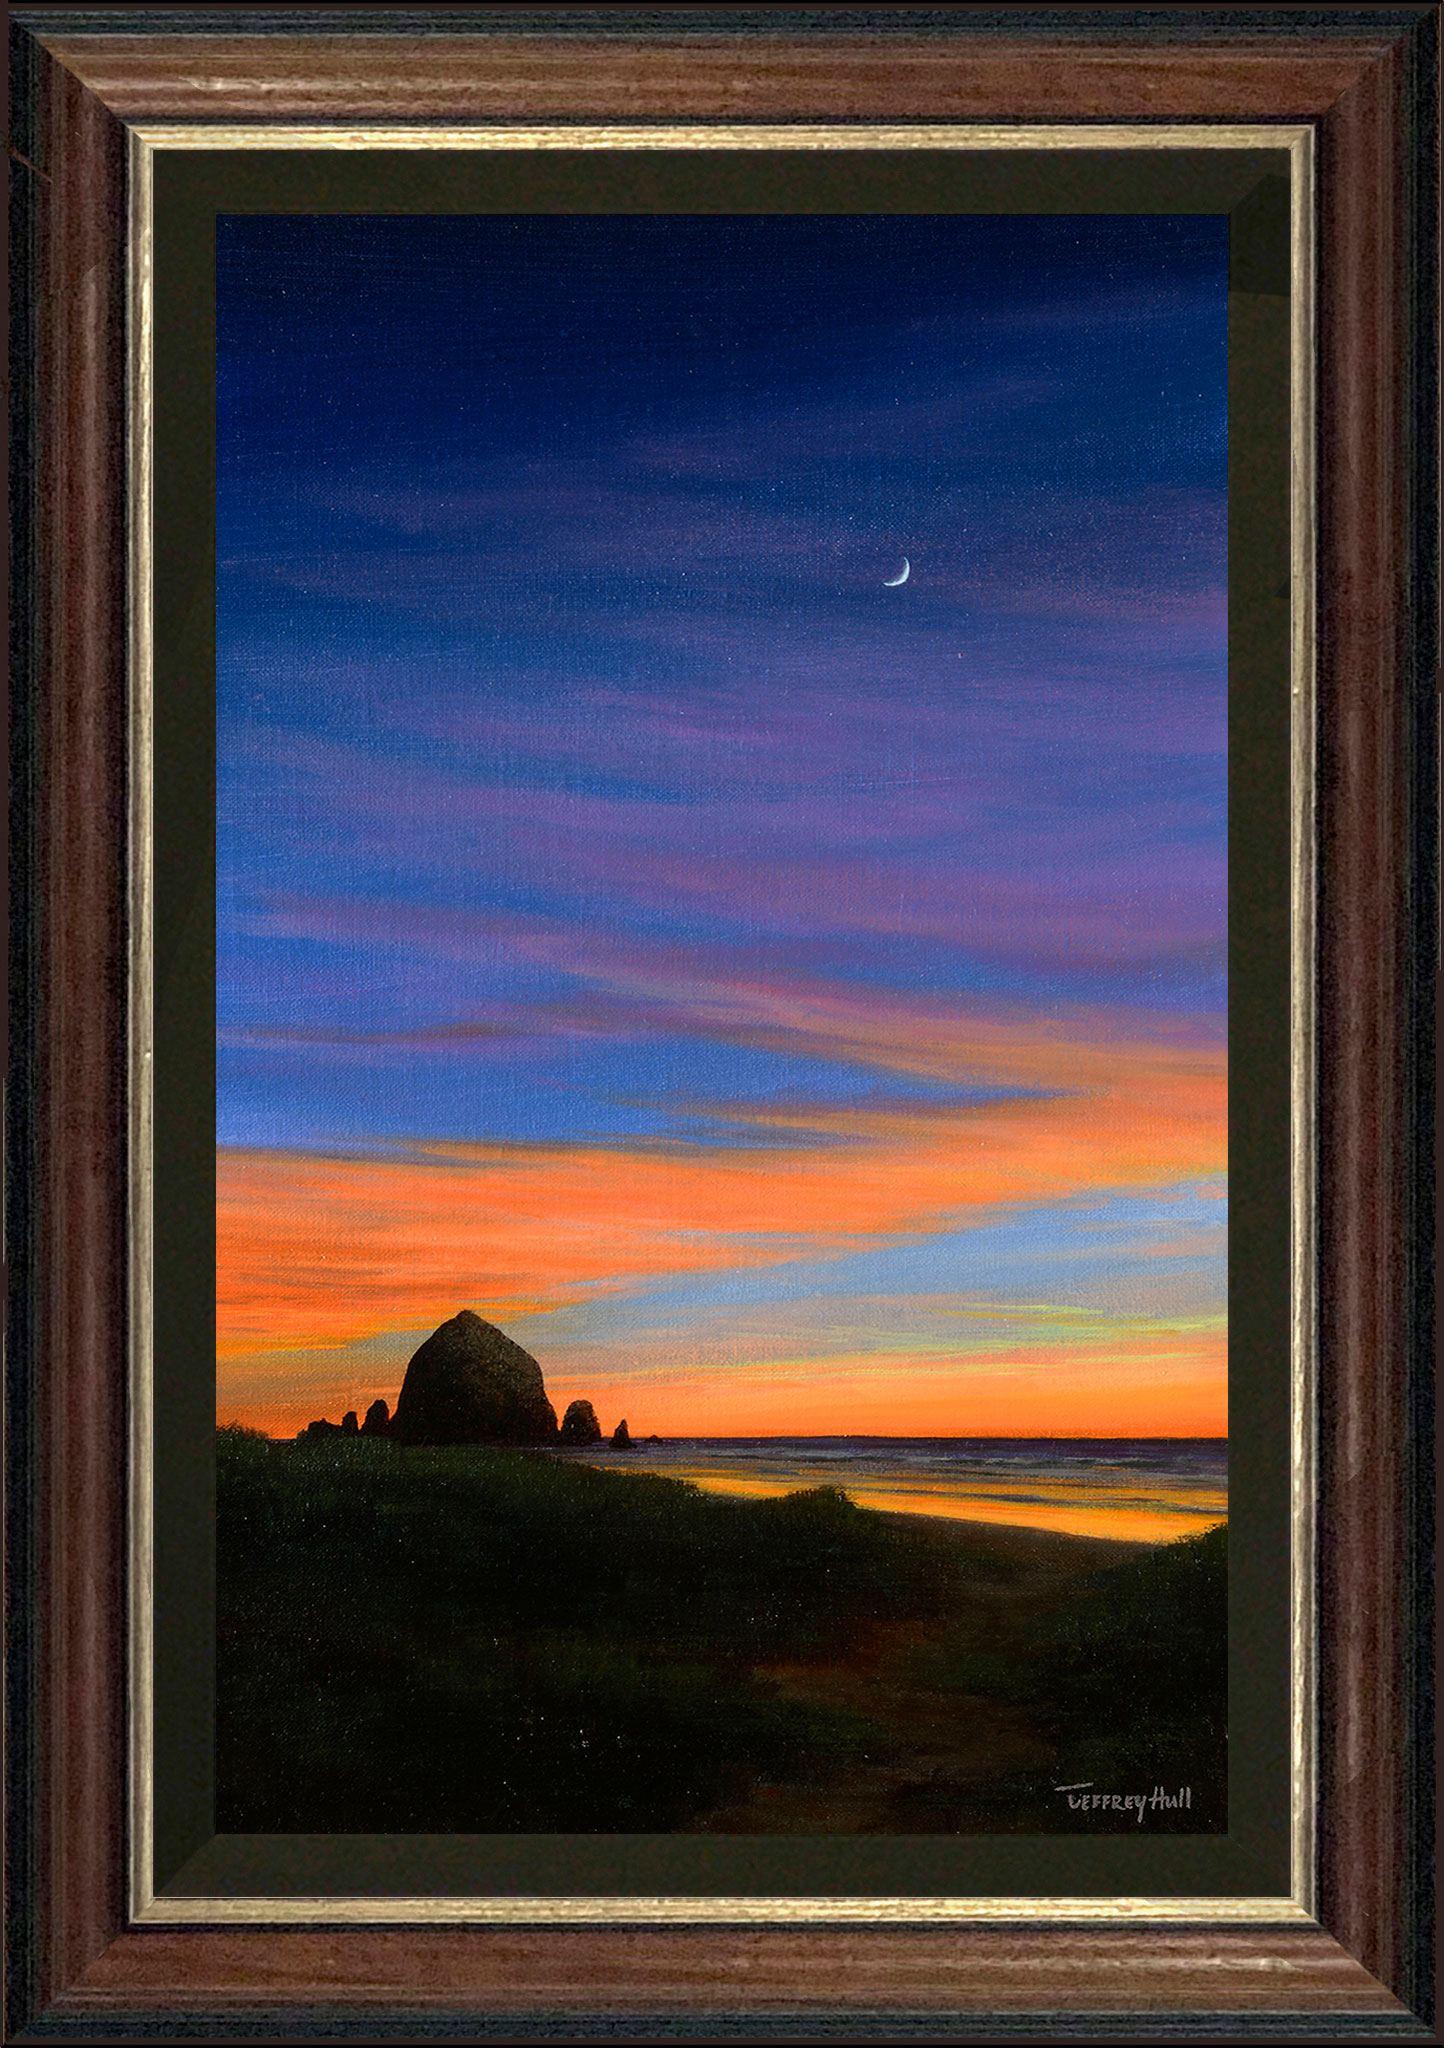 Late,-Late-Sunset-LimEd-Malabar-Black-Liner-4-Website-2021